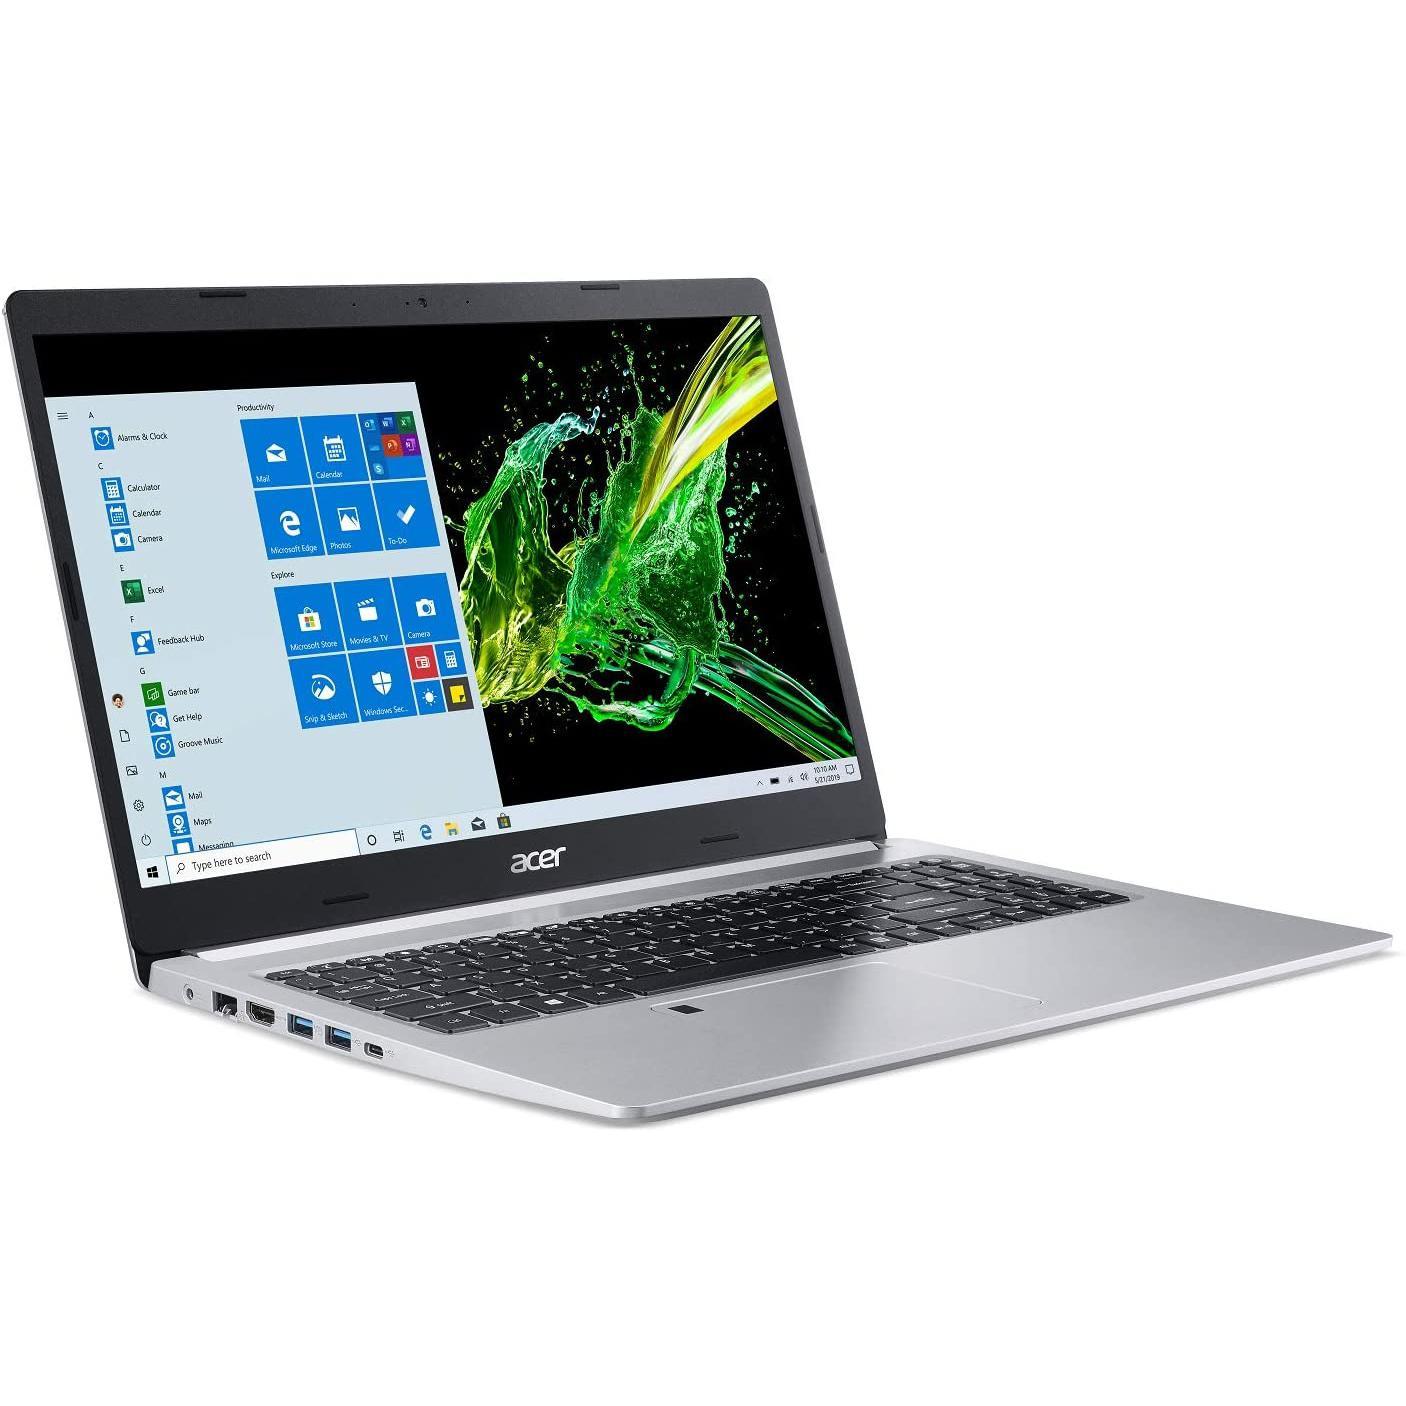 Acer Aspire 5 A515-55-56VK 15.6-inch (2019) - Core i5-1035G1 - 8 GB - SSD 256 GB